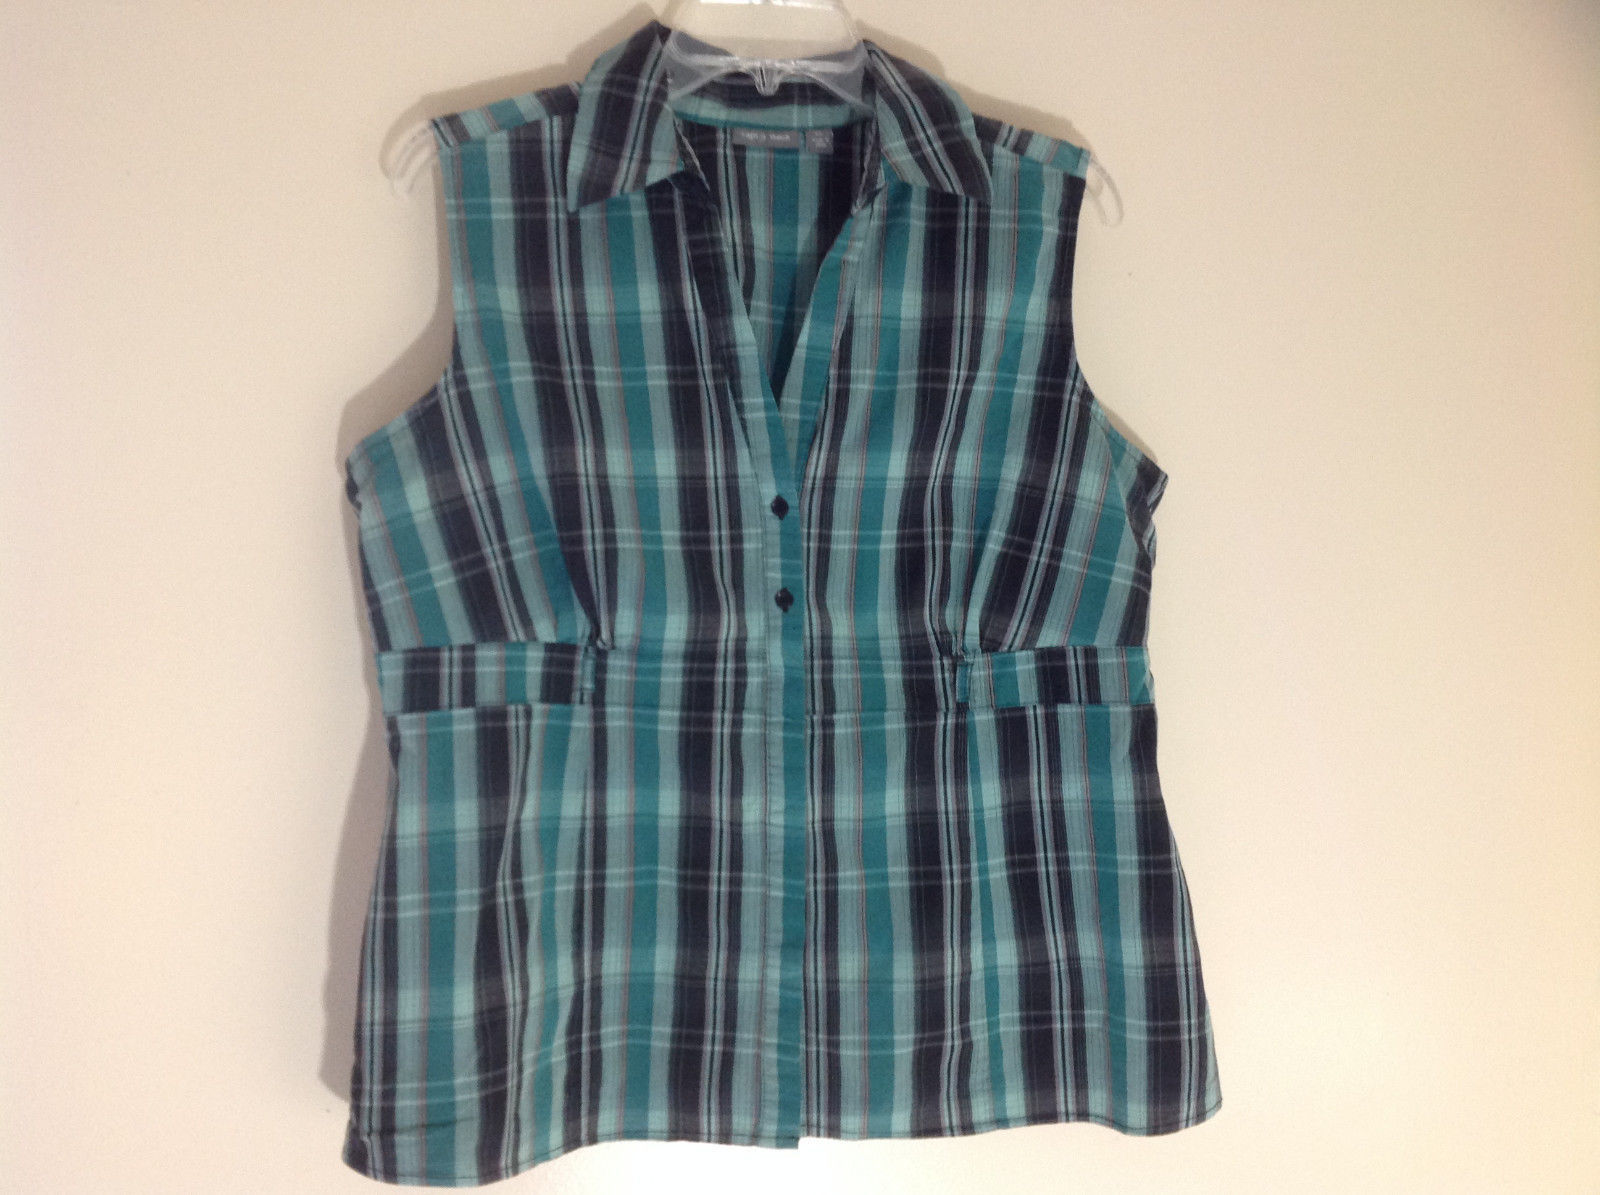 Apt. 9 Green Black Striped Sleeveless Button Up V-Neckline Blouse Size XL